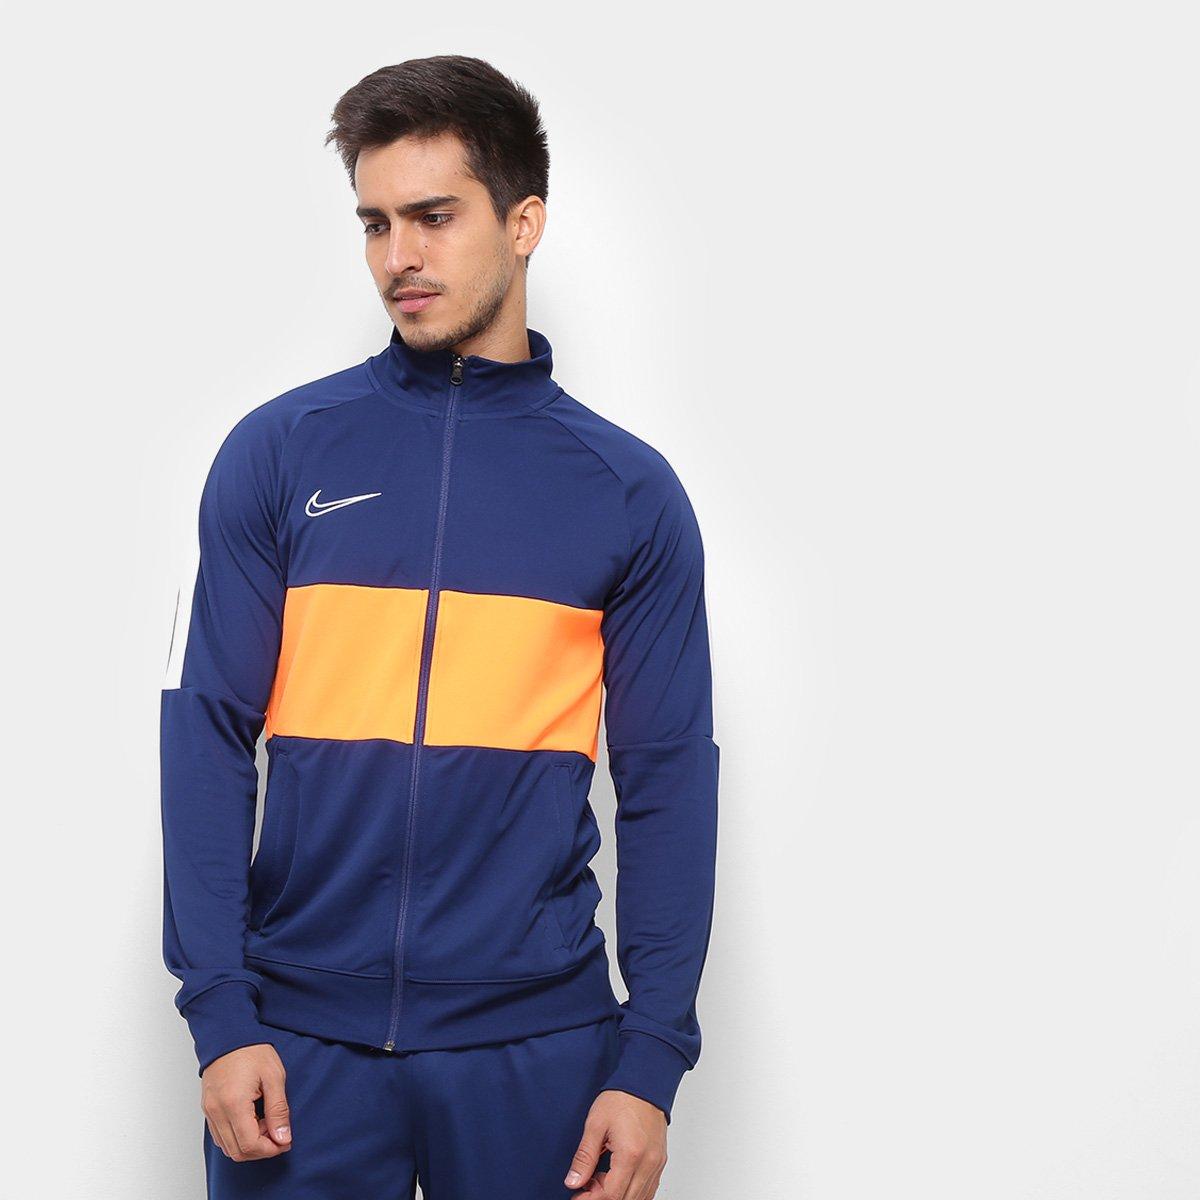 eebbab90618 Jaqueta Nike Academy Dry Fit TRK Masculina - Azul e Branco - Compre Agora